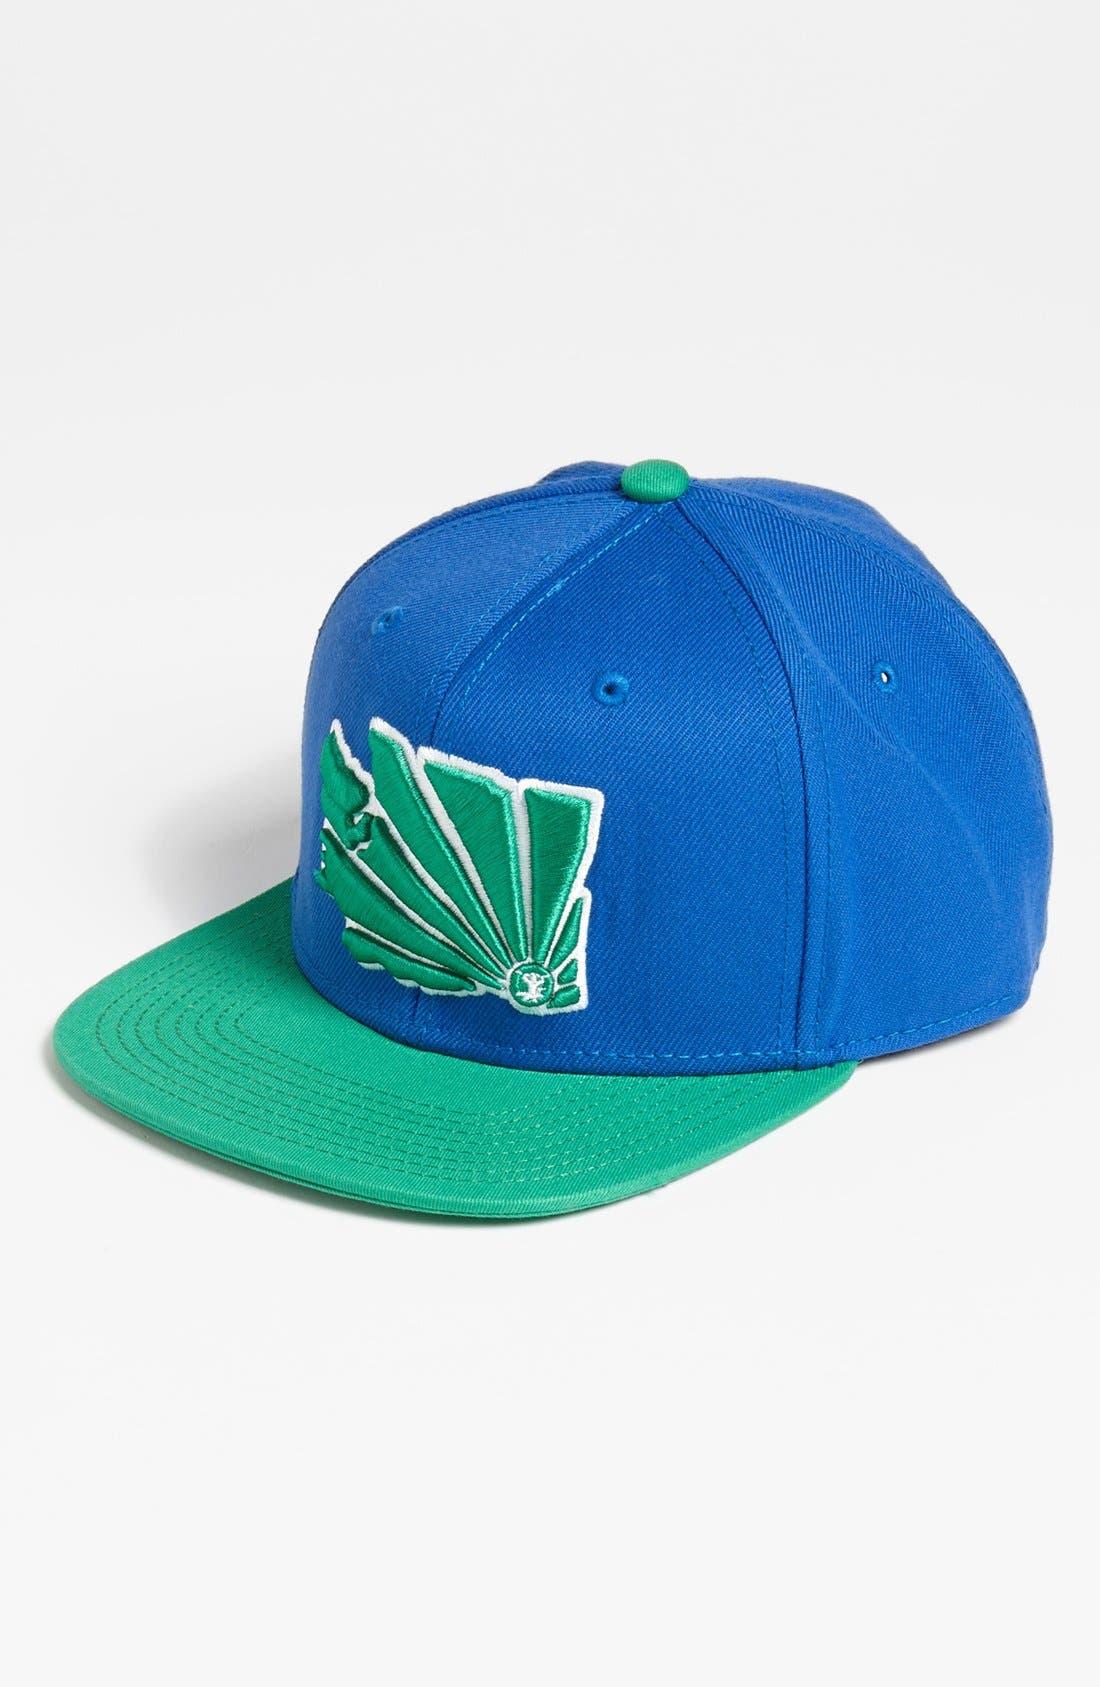 Main Image - Casual Industrees 'WA Brah' Snapback Baseball Cap